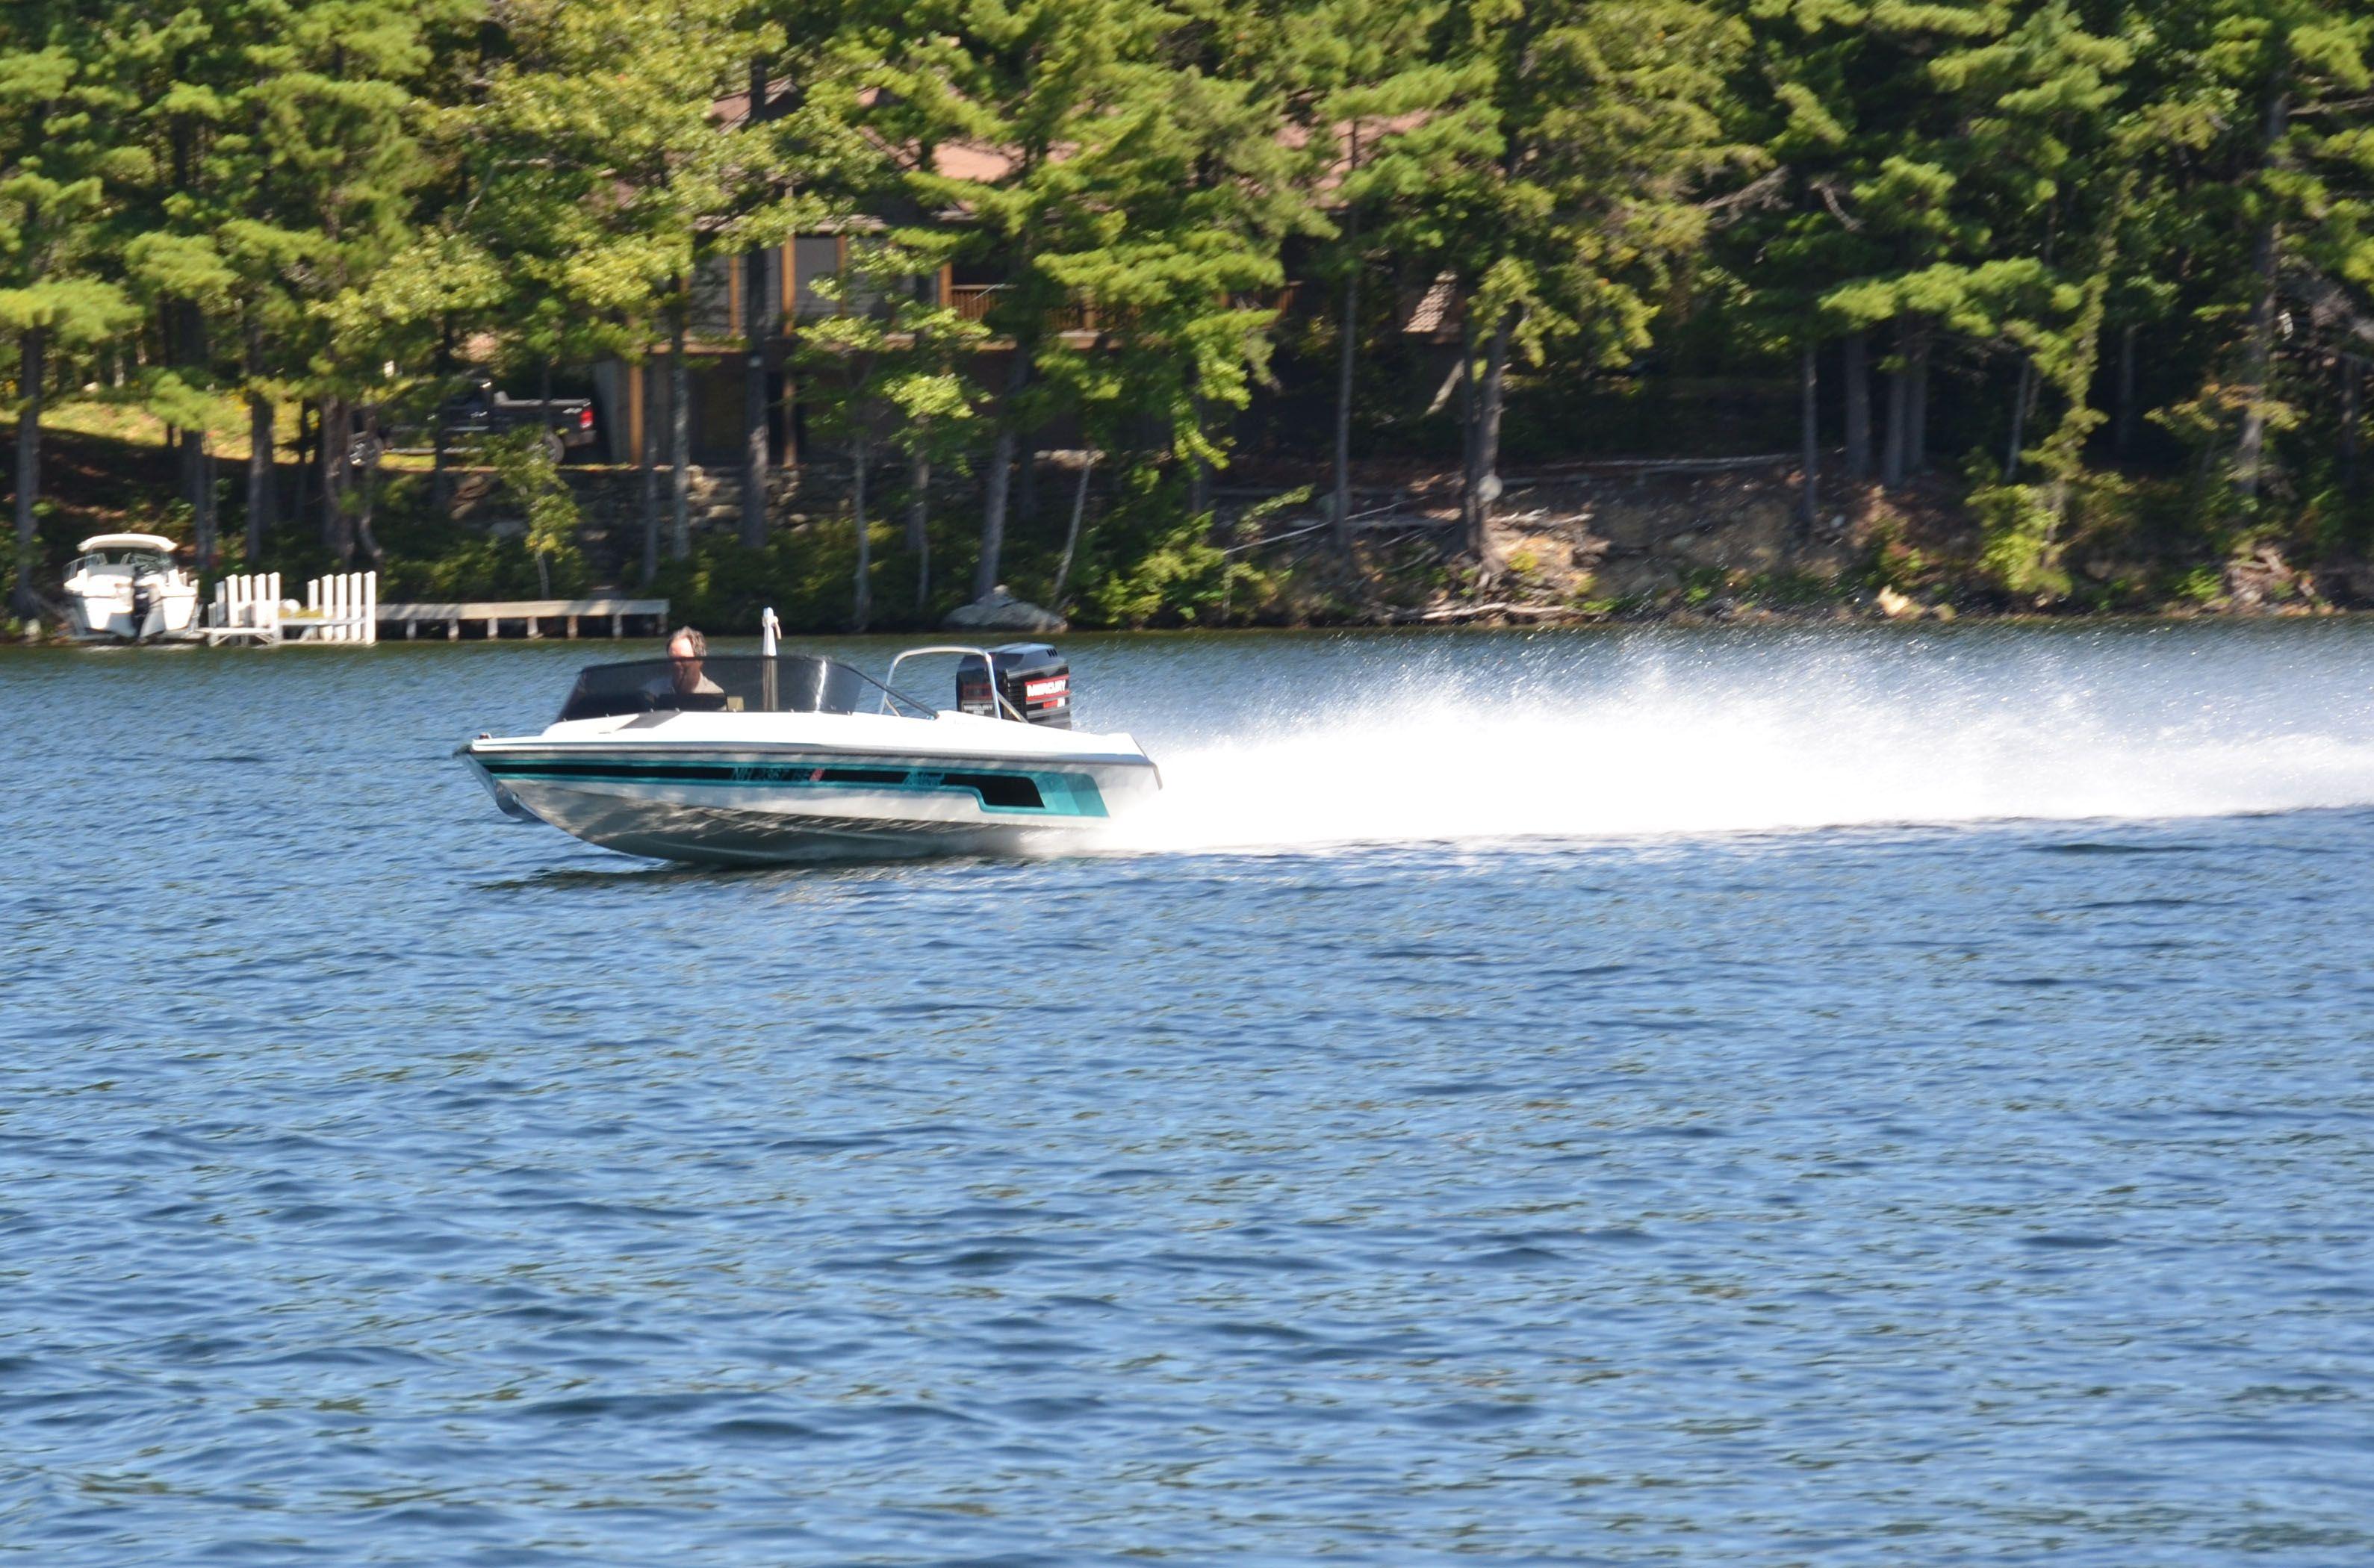 Malibu Flightcraft Ski Boats Boat Malibu